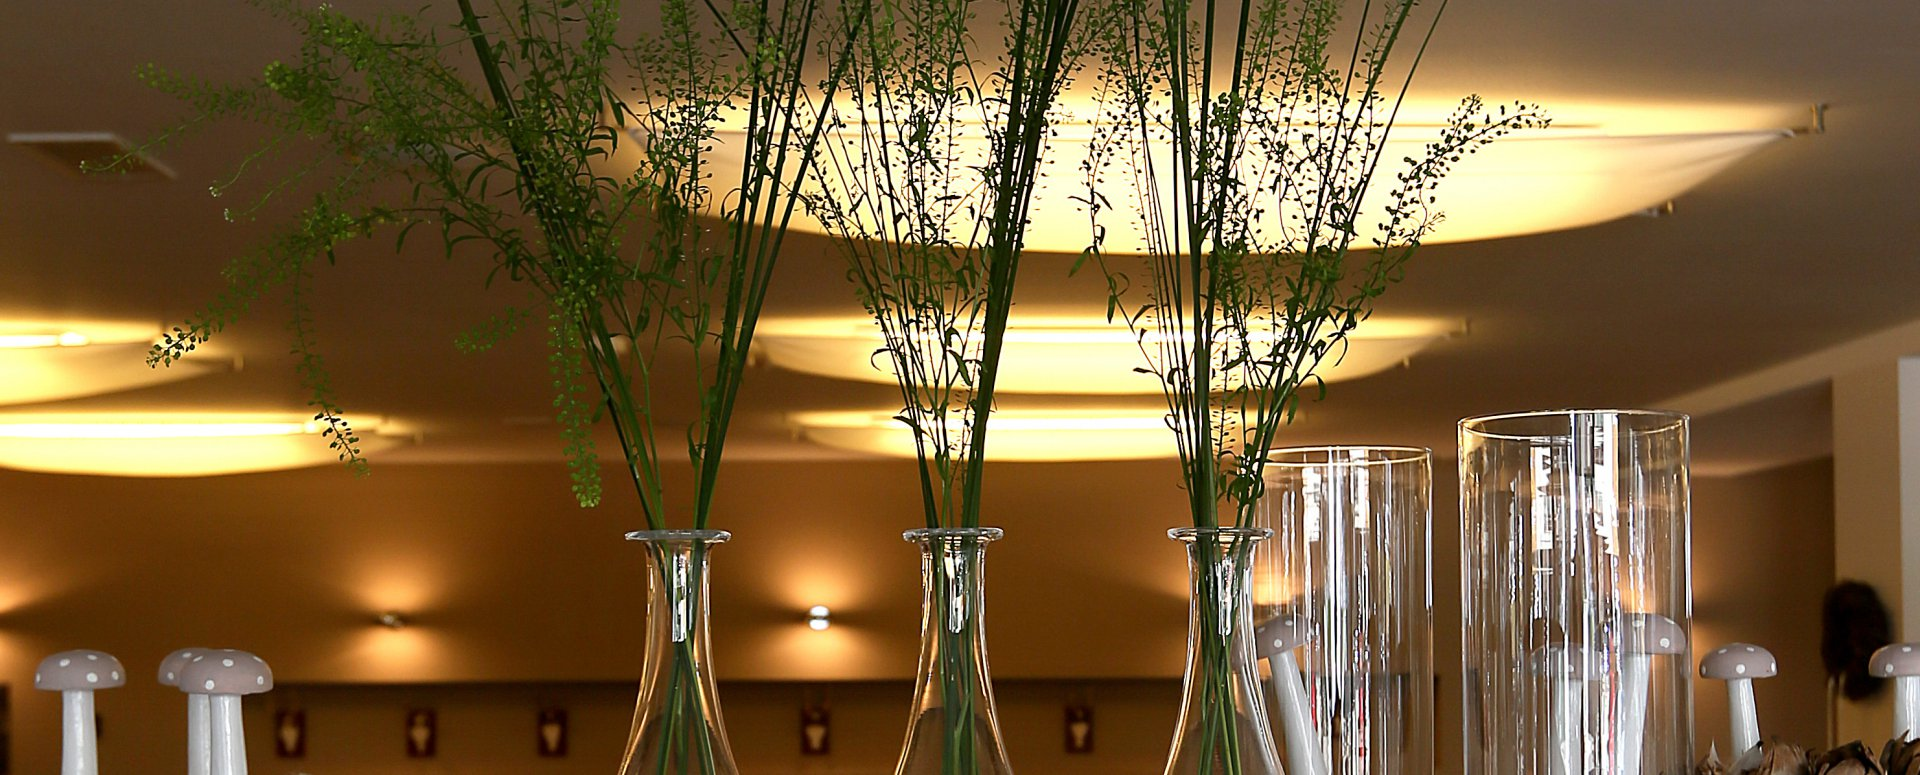 4 sterne urlaub im designhotel in brand hotel sarotla for Urlaub designhotel